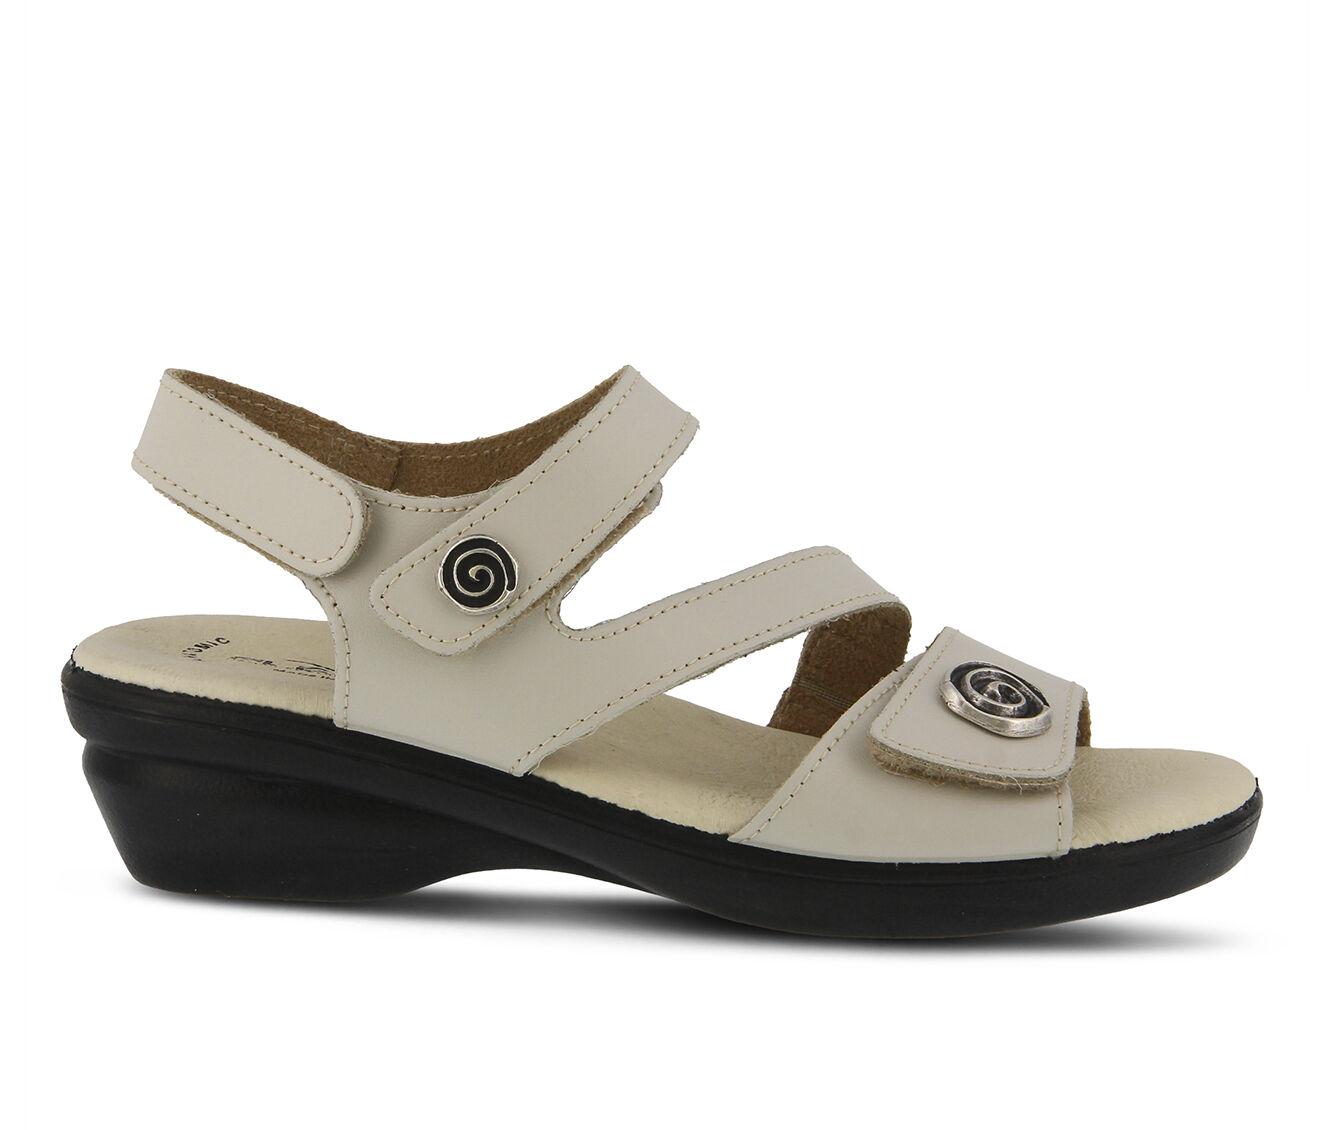 Buy Original Women's FLEXUS Safa Sandals Off White